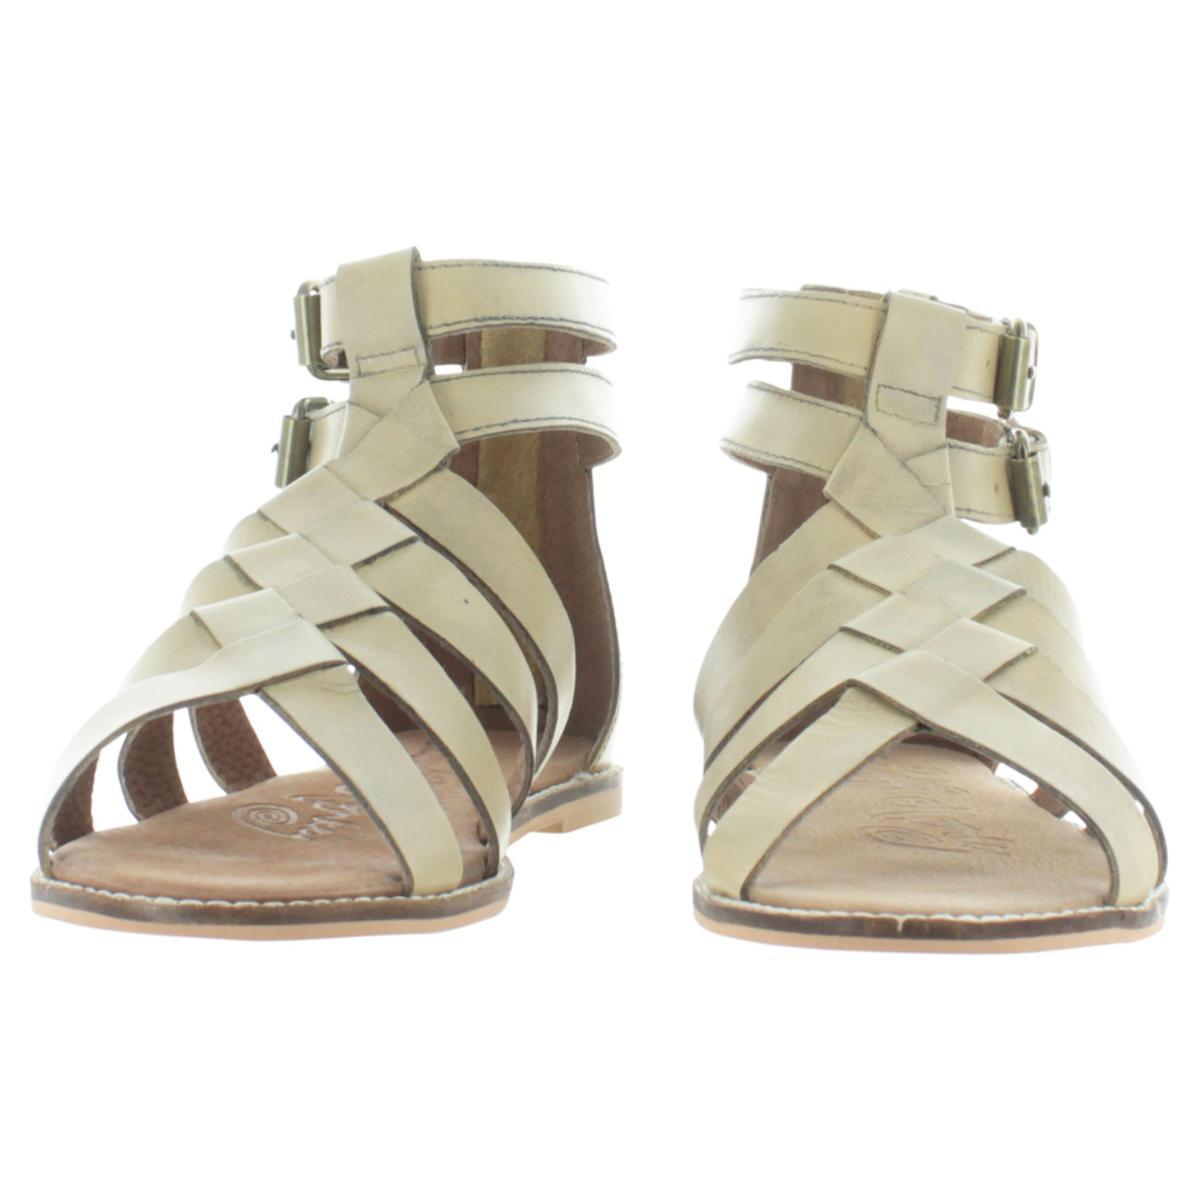 63f05730ba7a Naughty Monkey Cilani Women s Leather Woven Gladiator Sandals